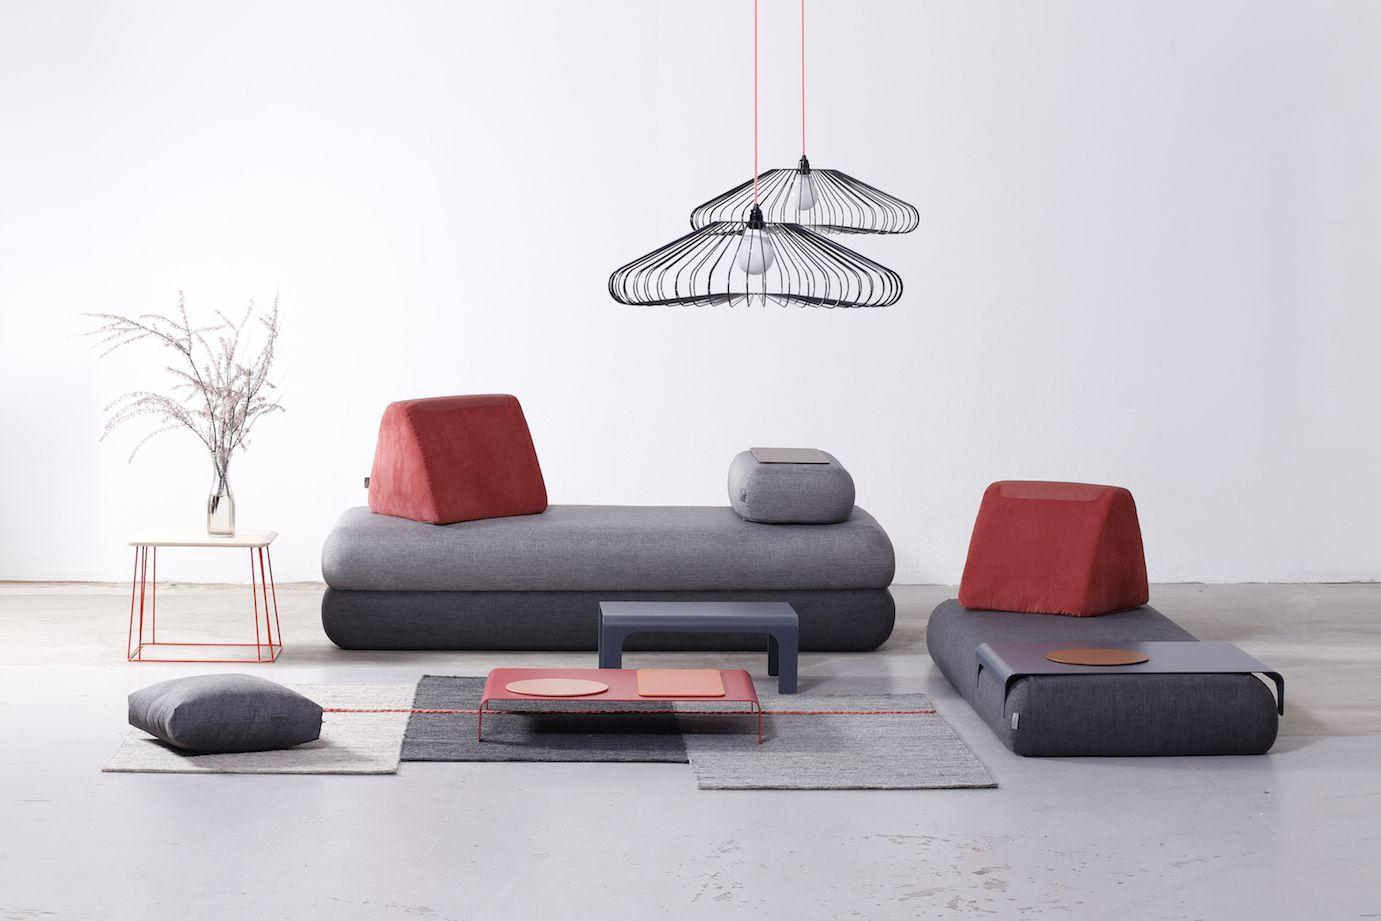 U0027Boat Sofau0027 By Bongyoel Yang In 100 Creative Furniture: Reloaded   Furniture    Pinterest Great Ideas